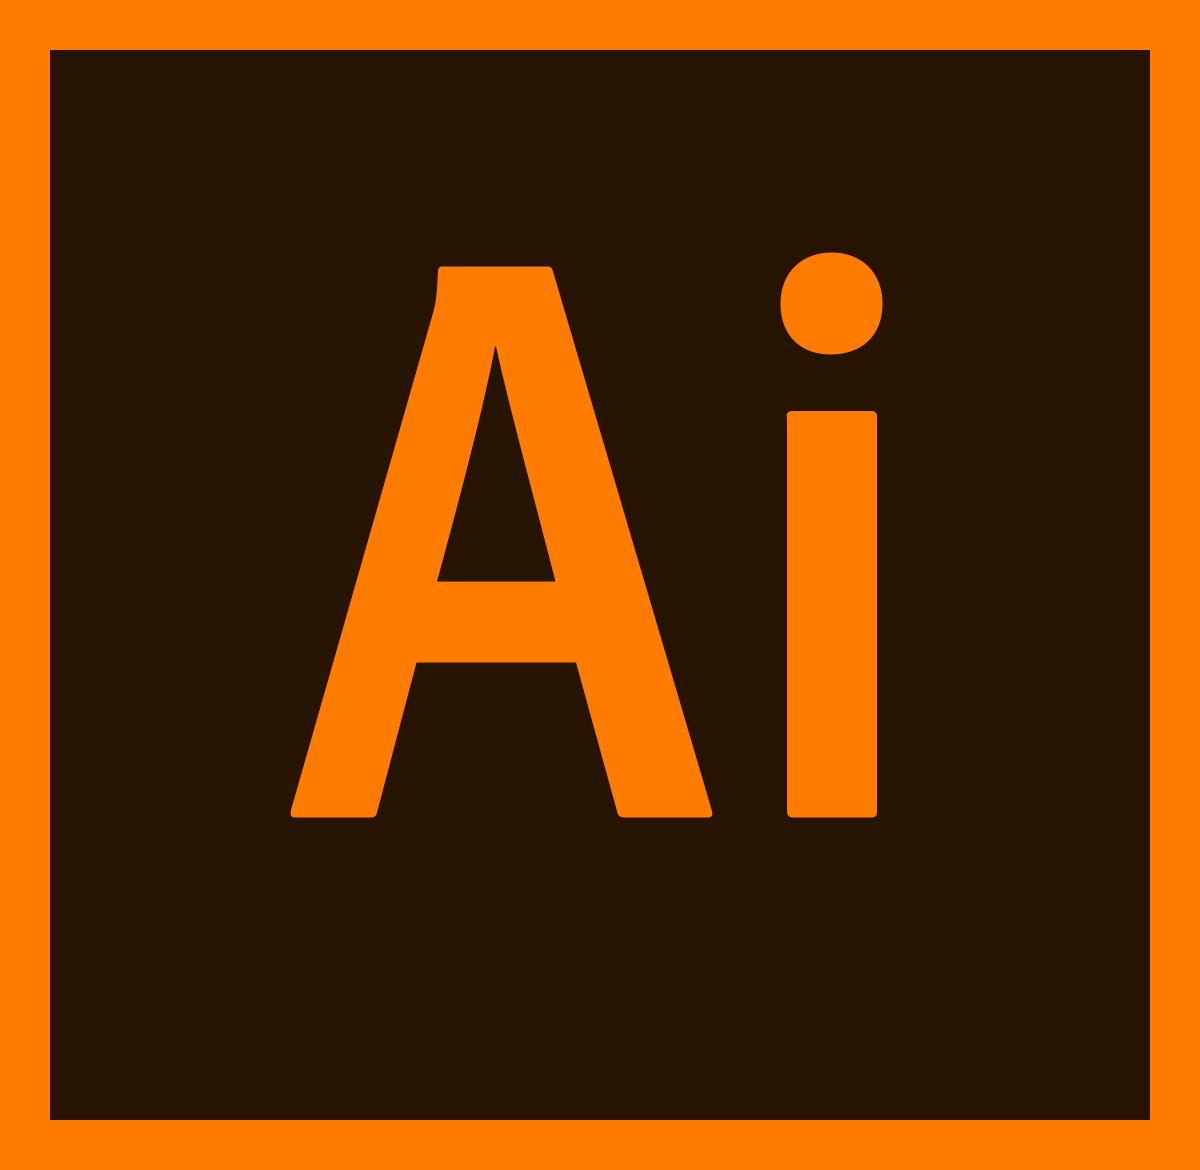 Adobe Illustrator CC Crack 2017 & License Key Full Free Download